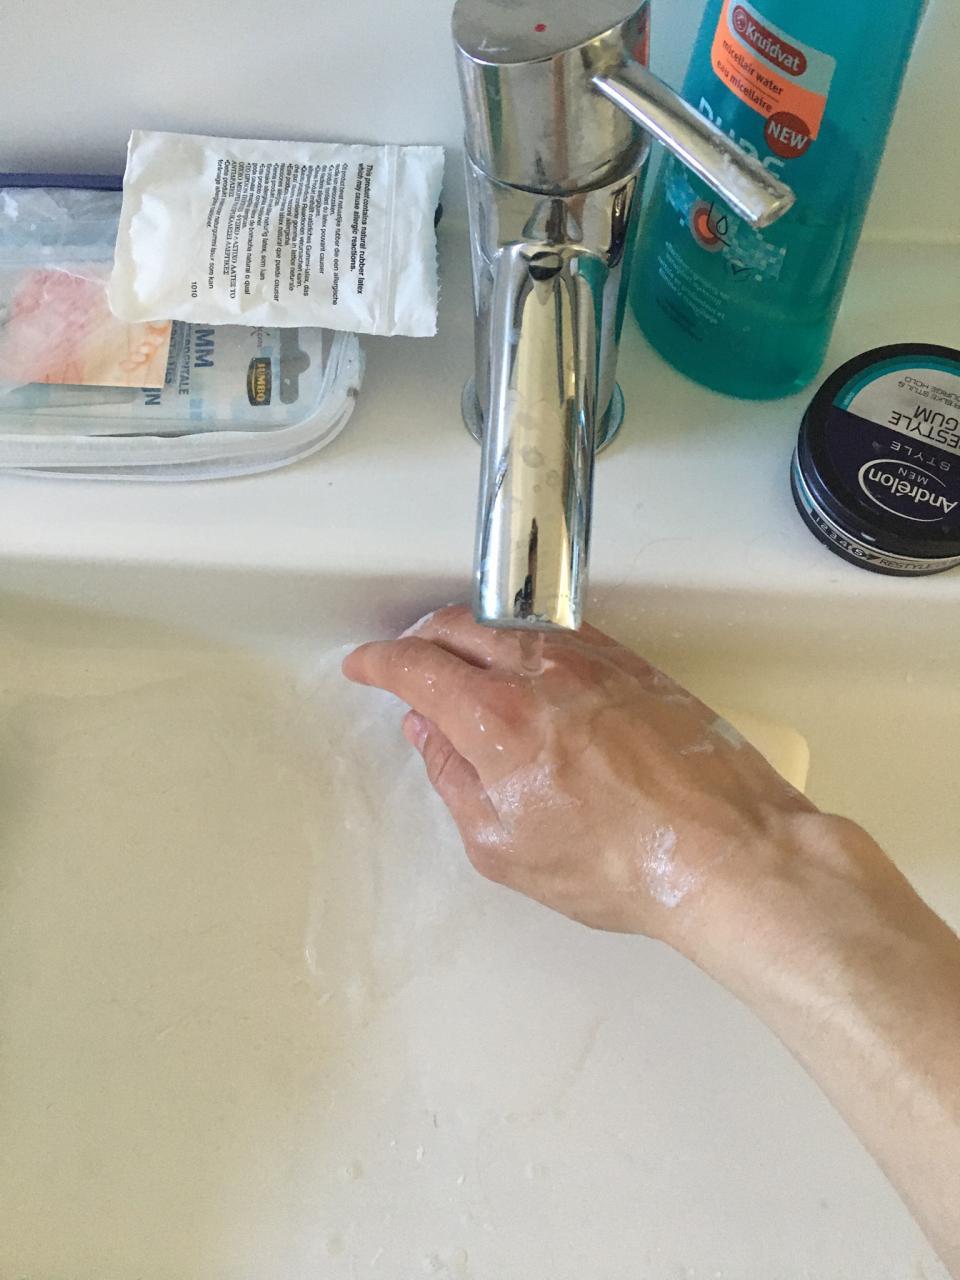 Scouting Impeesa Amersfoort - on-line opkomst handen wassen